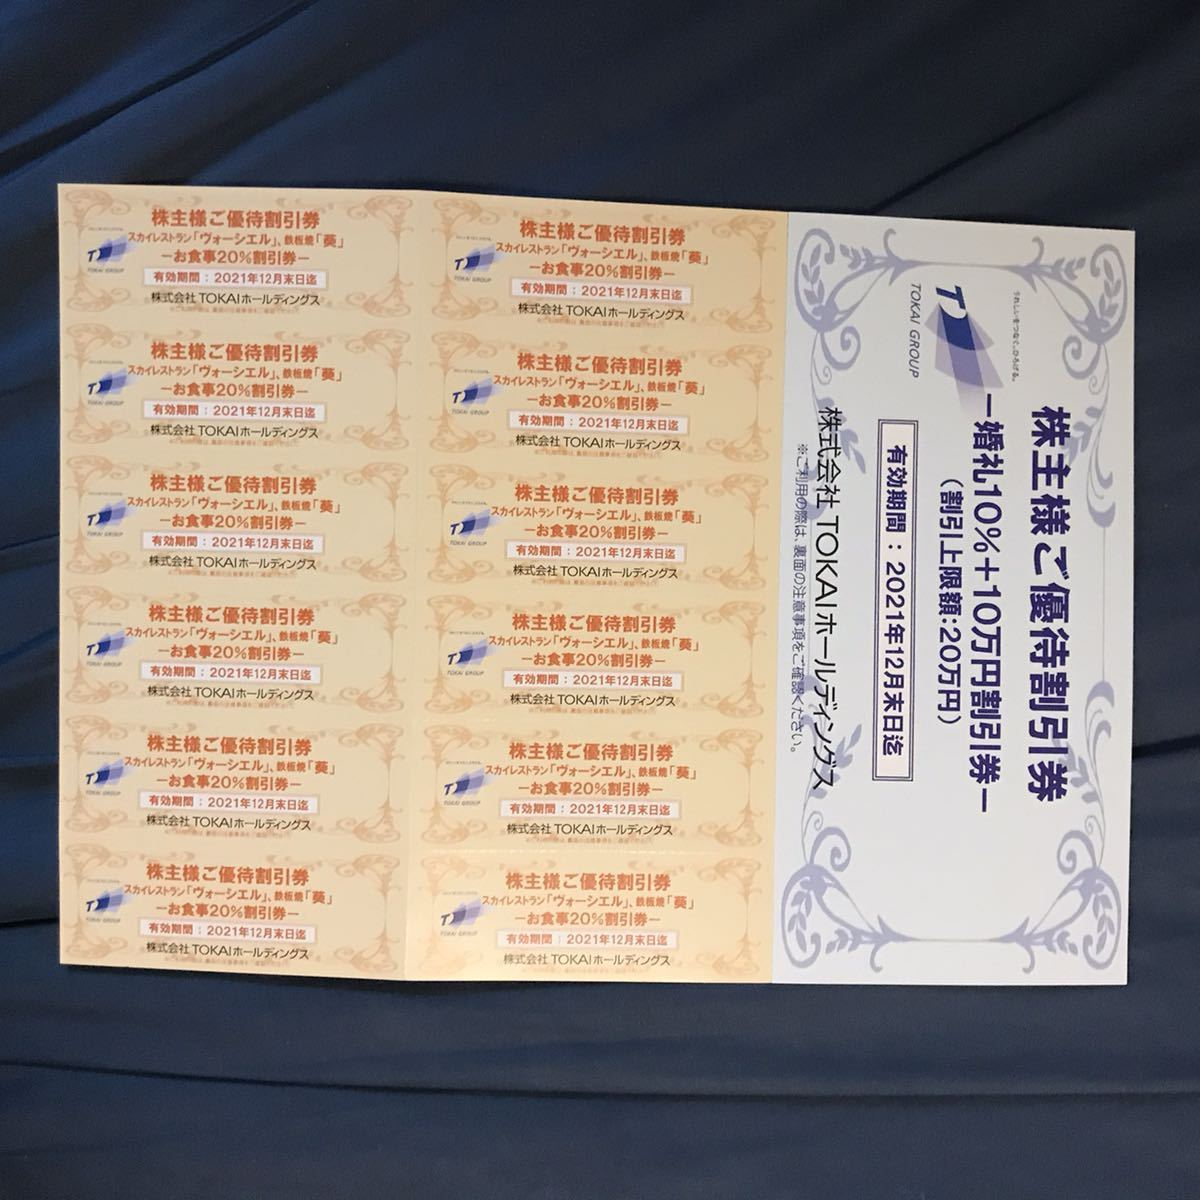 TOKAIホールディングス株主優待 婚礼割引券+お食事20%割引券×12枚 2021/12月末日まで_画像1